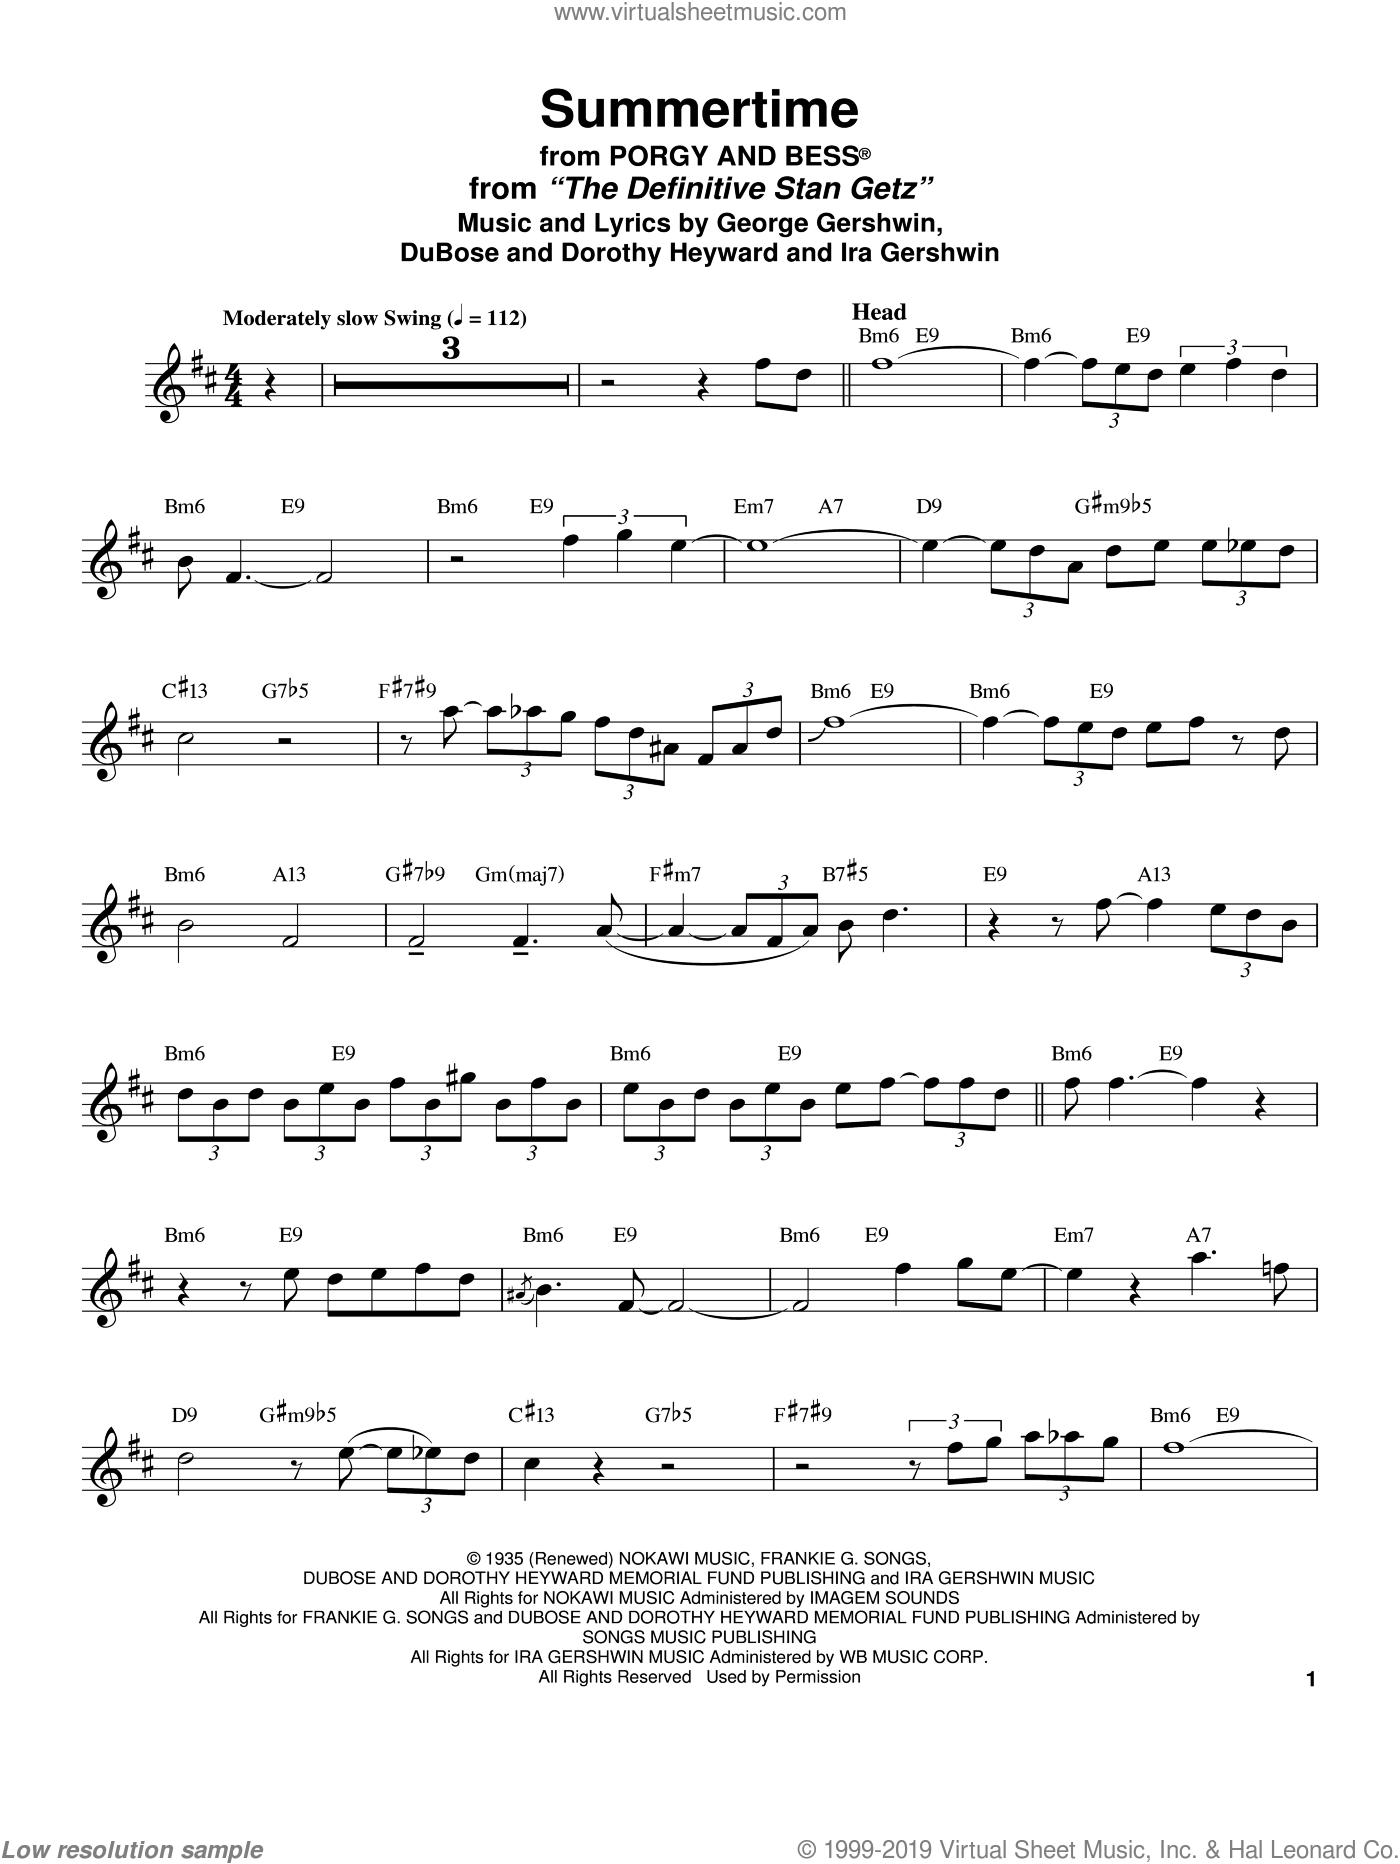 Summertime sheet music for tenor saxophone solo (transcription) by Stan Getz, Dorothy Heyward, DuBose Heyward, George Gershwin and Ira Gershwin, intermediate tenor saxophone (transcription)